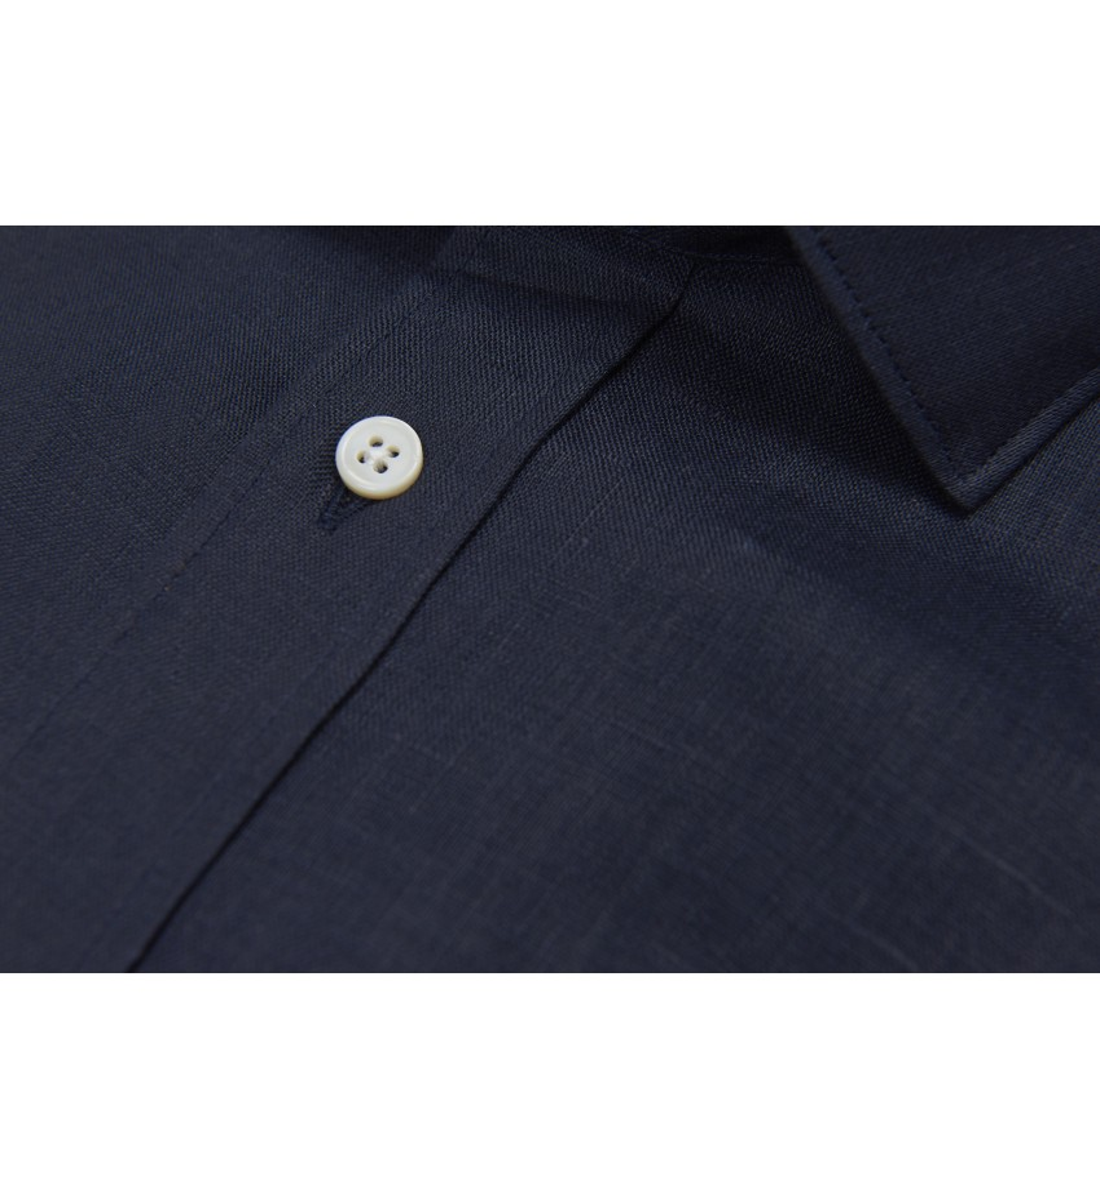 Chemise coupe droite 100% LIN marine